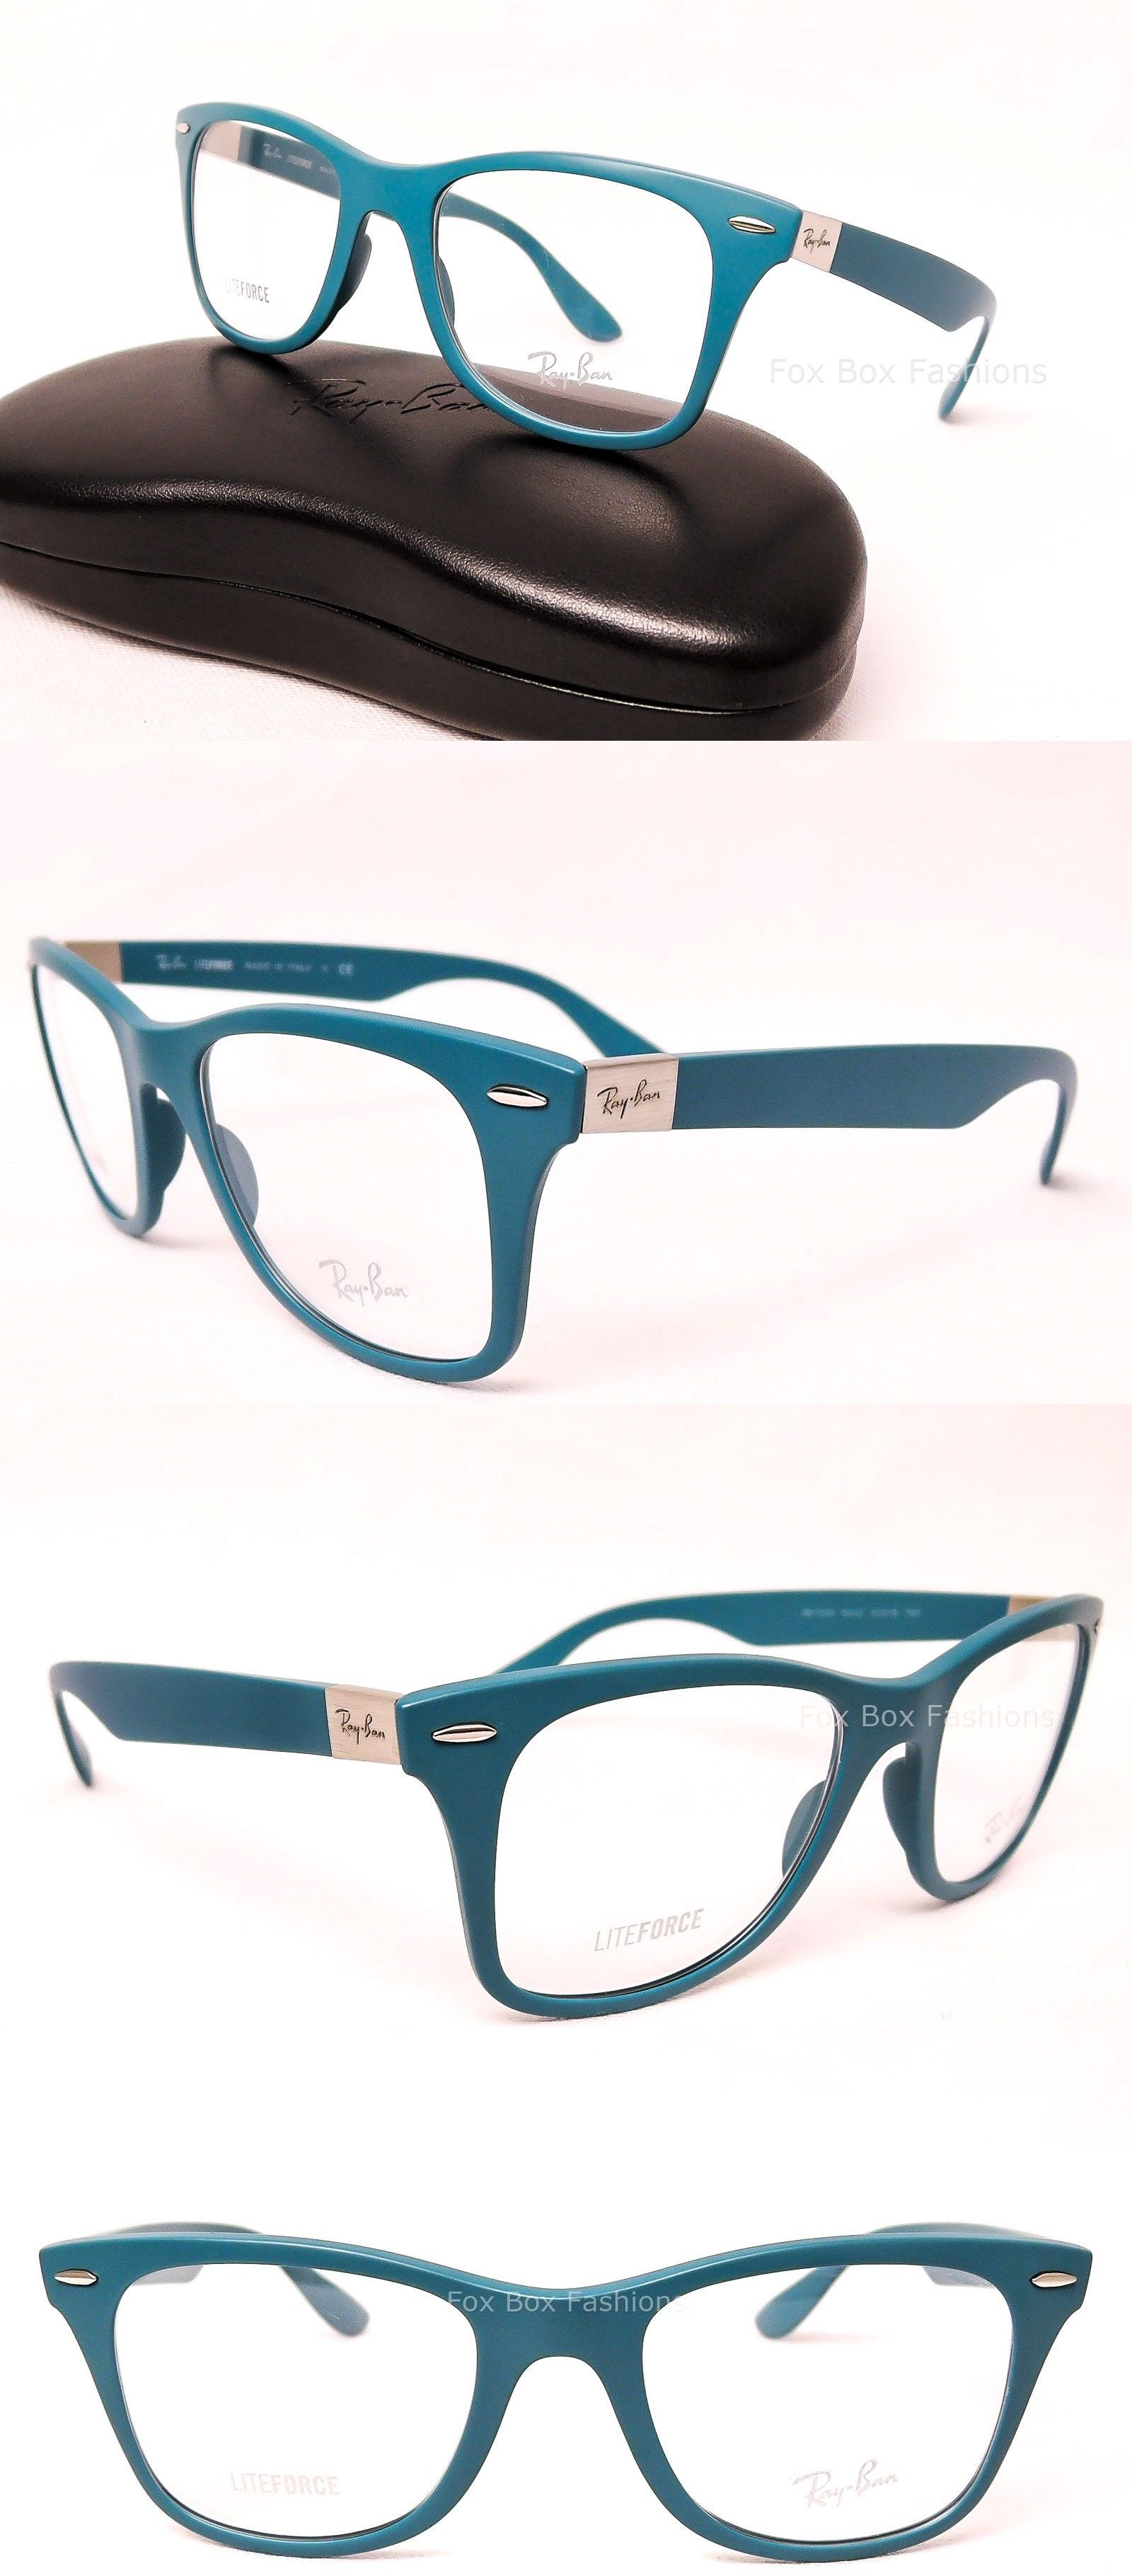 32e8d40a93e3 Eyeglass Frames  Ray-Ban 7034 5442 Liteforce Eyeglasses Optical Frames  Glasses Blue 50Mm -  BUY IT NOW ONLY   68.95 on eBay!